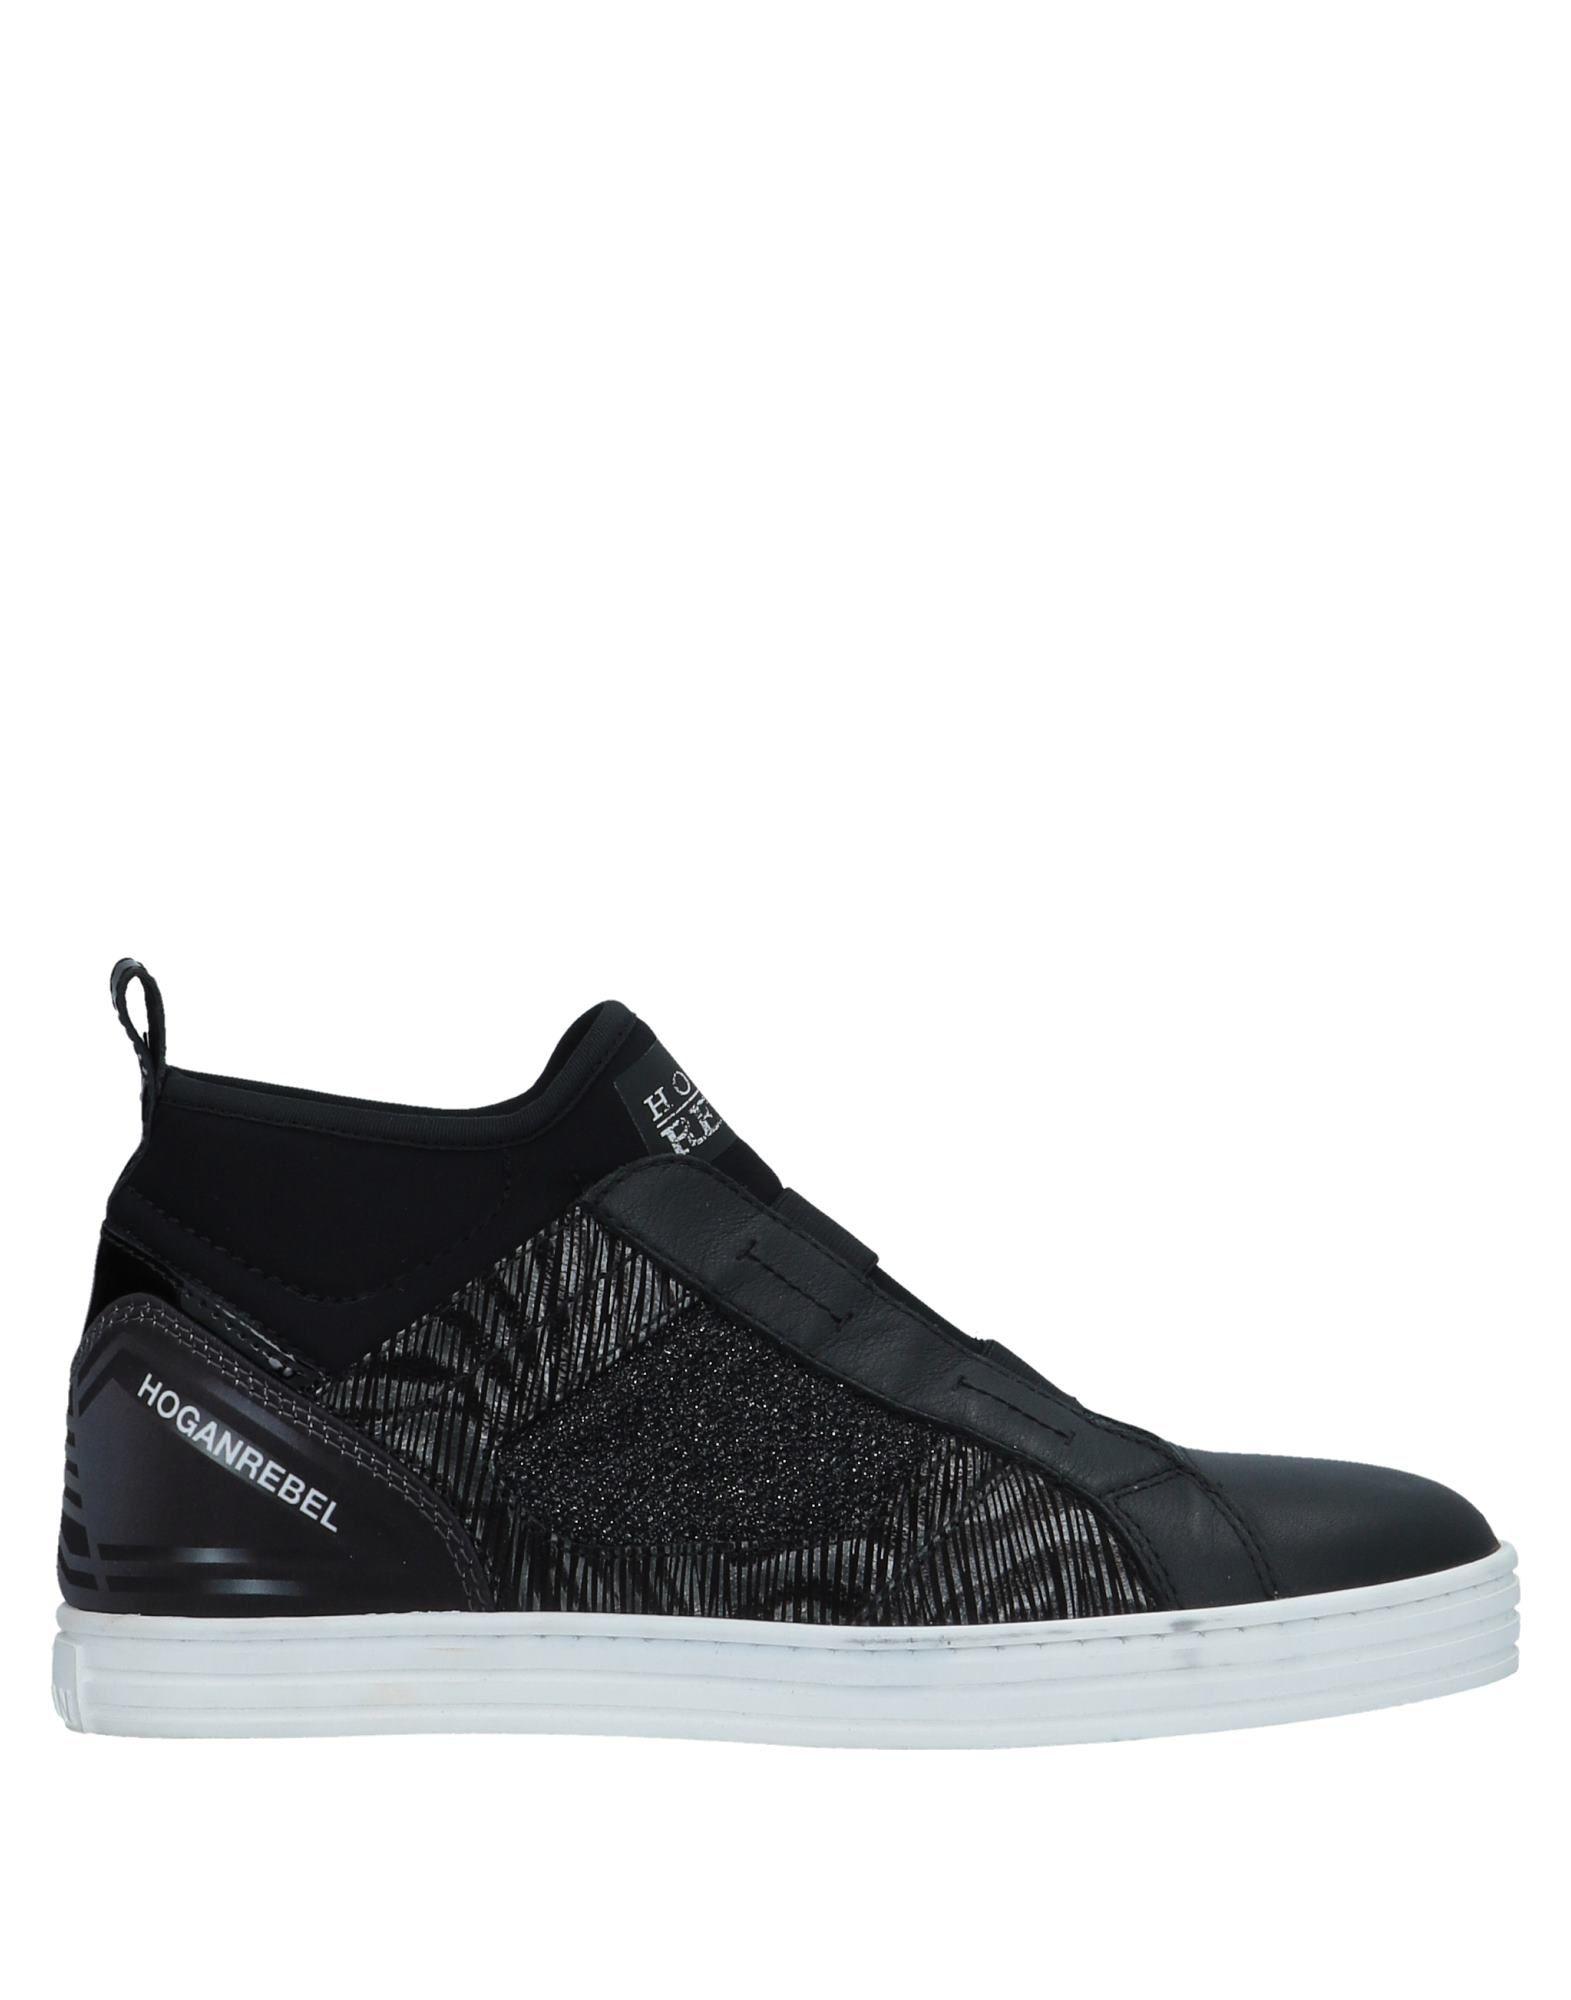 Stilvolle billige Schuhe Damen Hogan Rebel Sneakers Damen Schuhe  11536833UF 10d62a